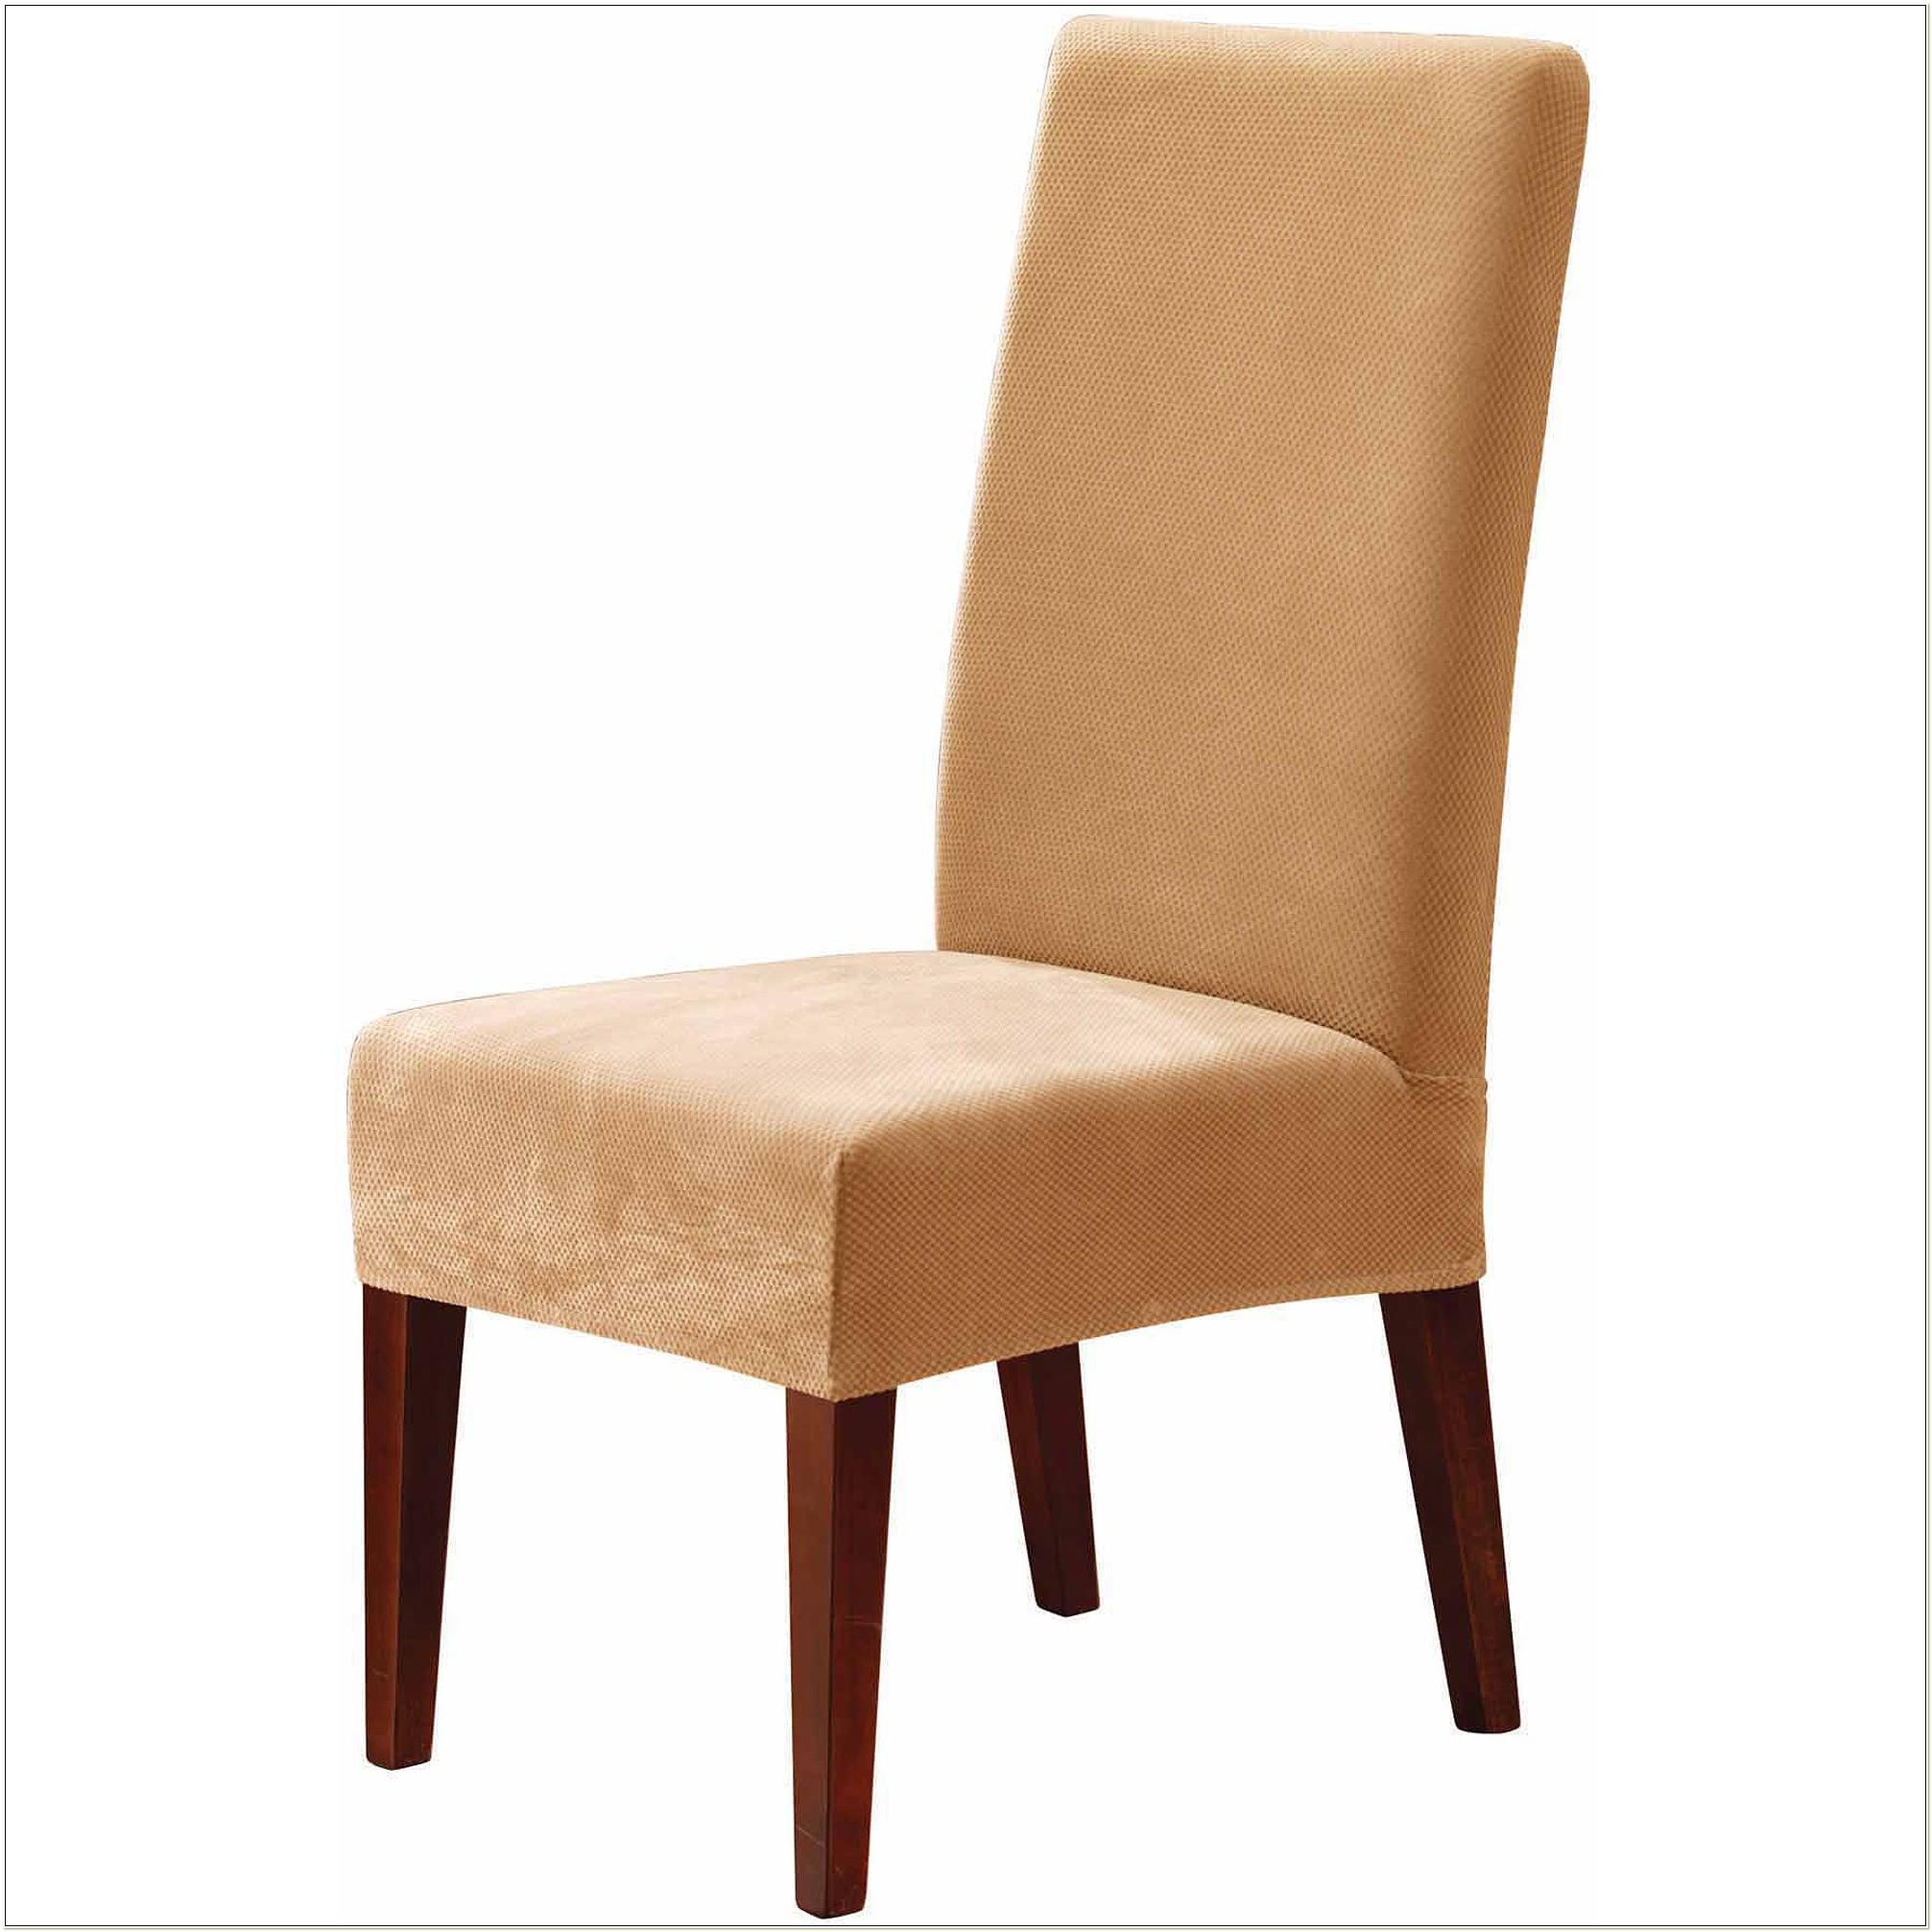 Stretch Piqu Dining Chair Slipcover Short